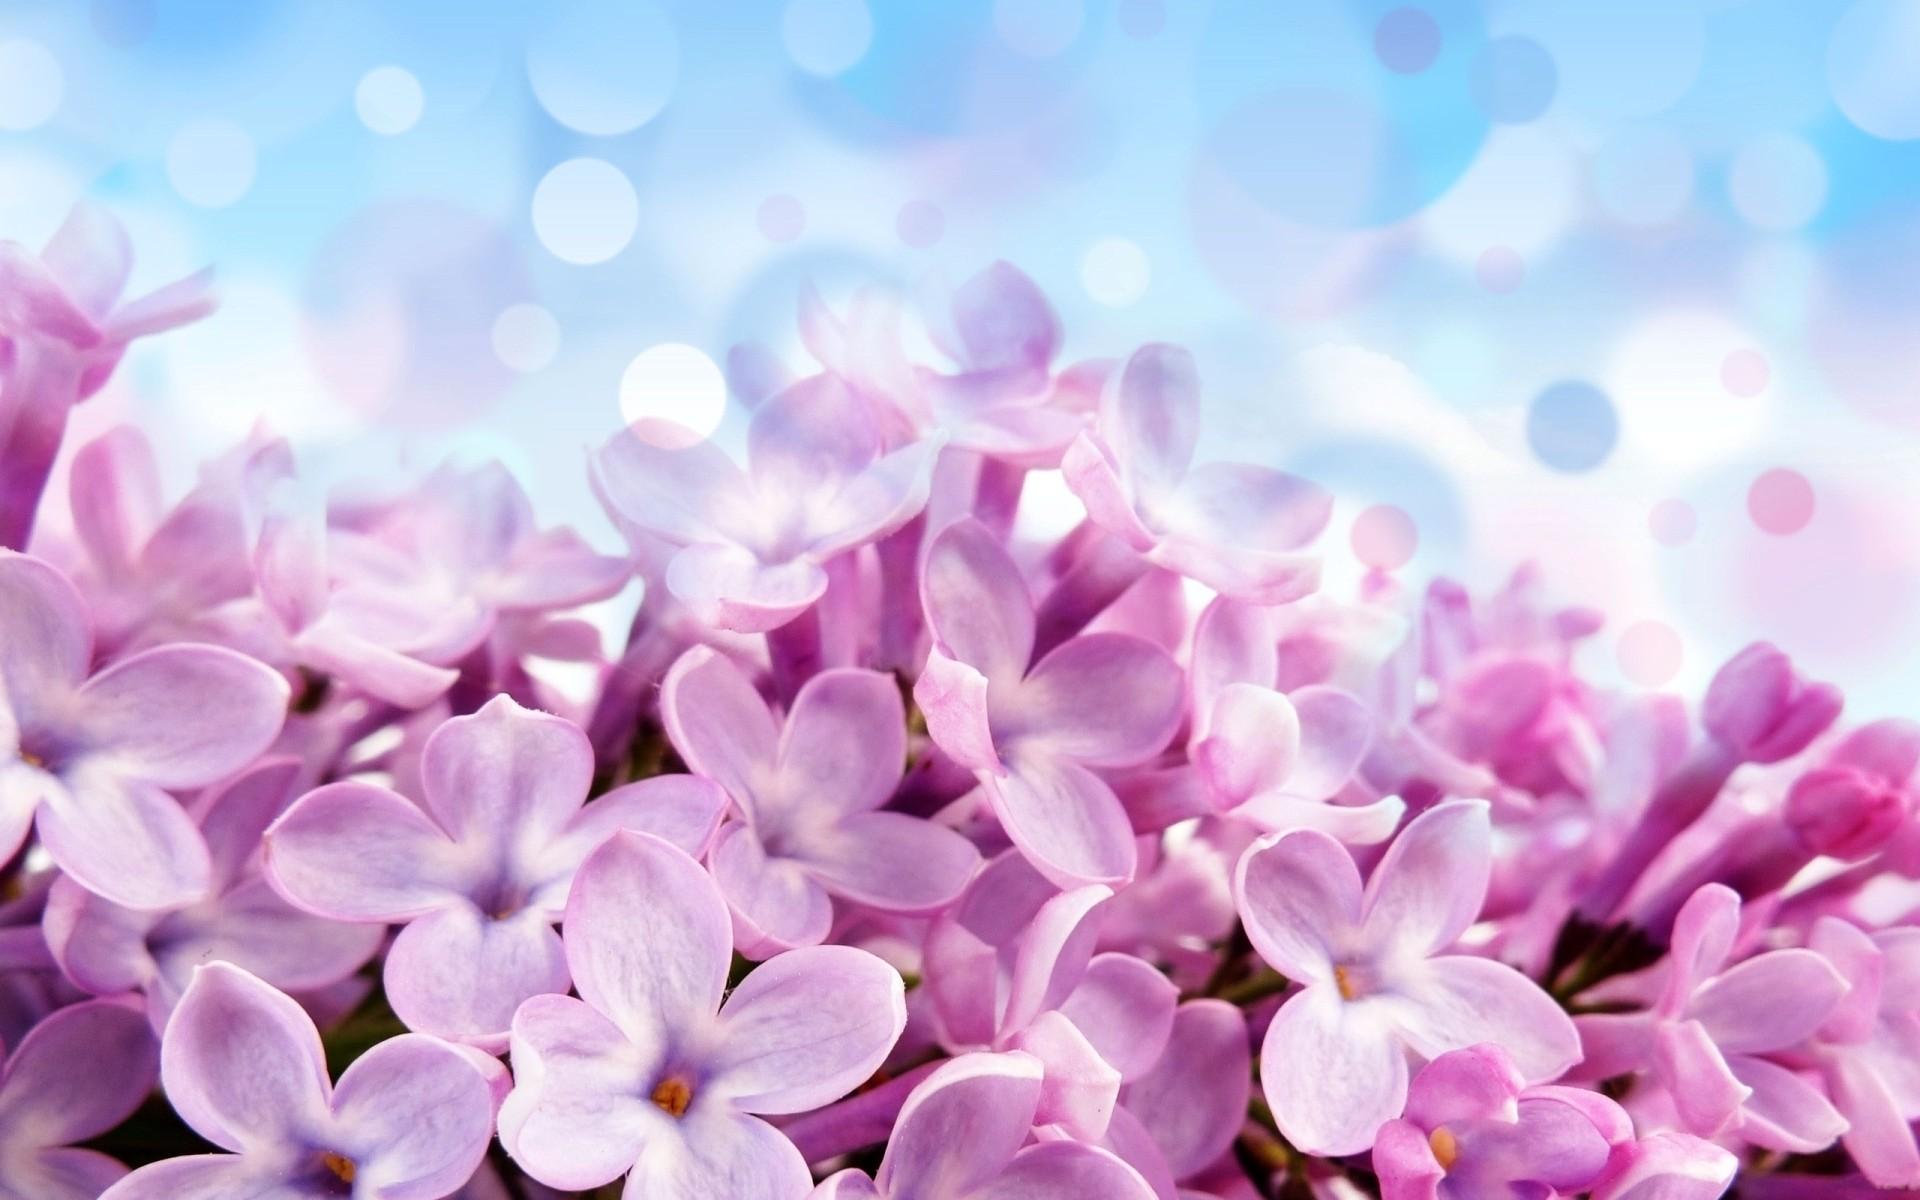 hyacinth wallpaper 20167